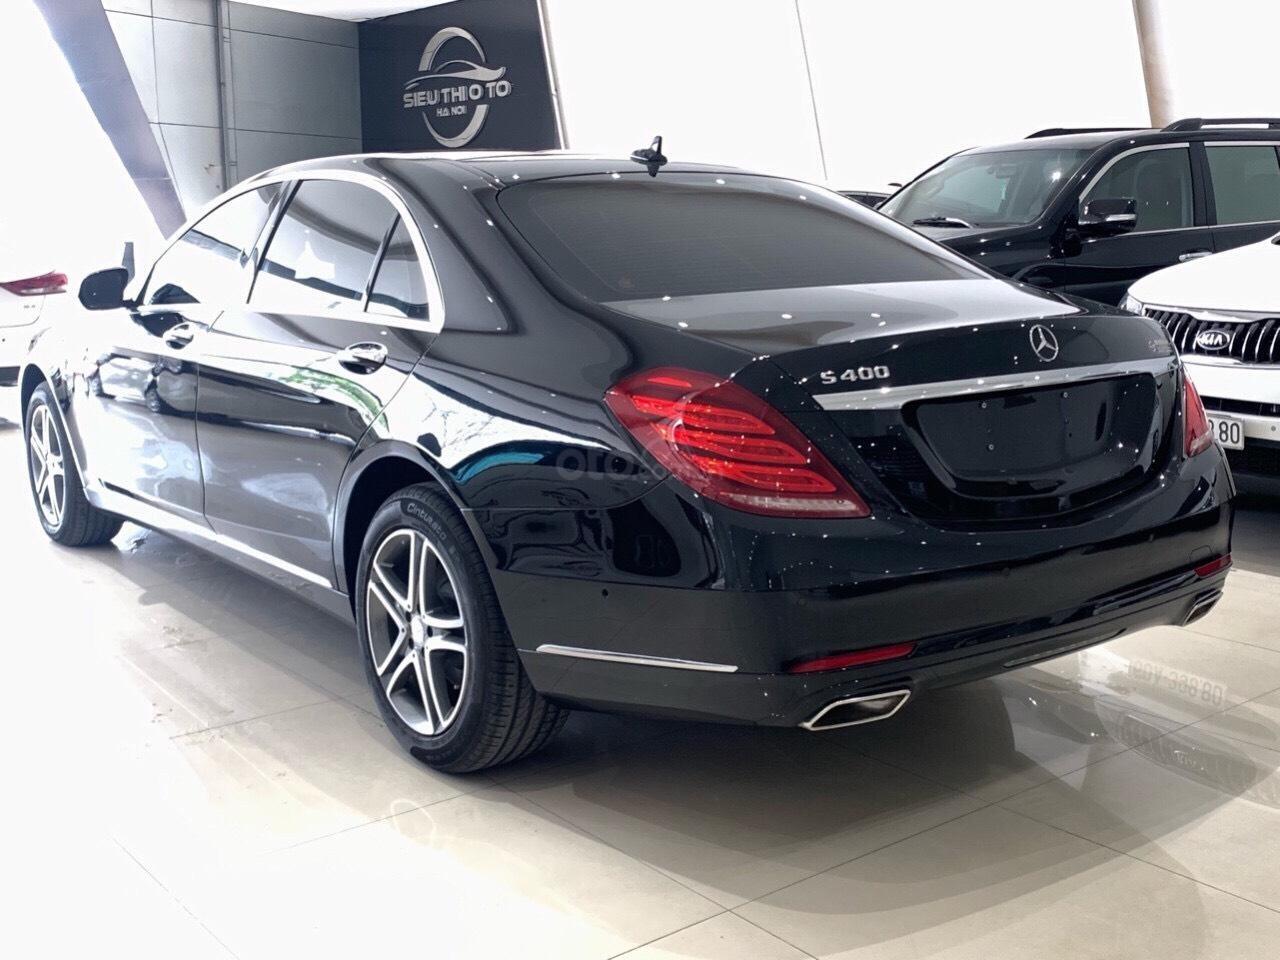 Bán Mercedes S400 2016, màu đen (3)